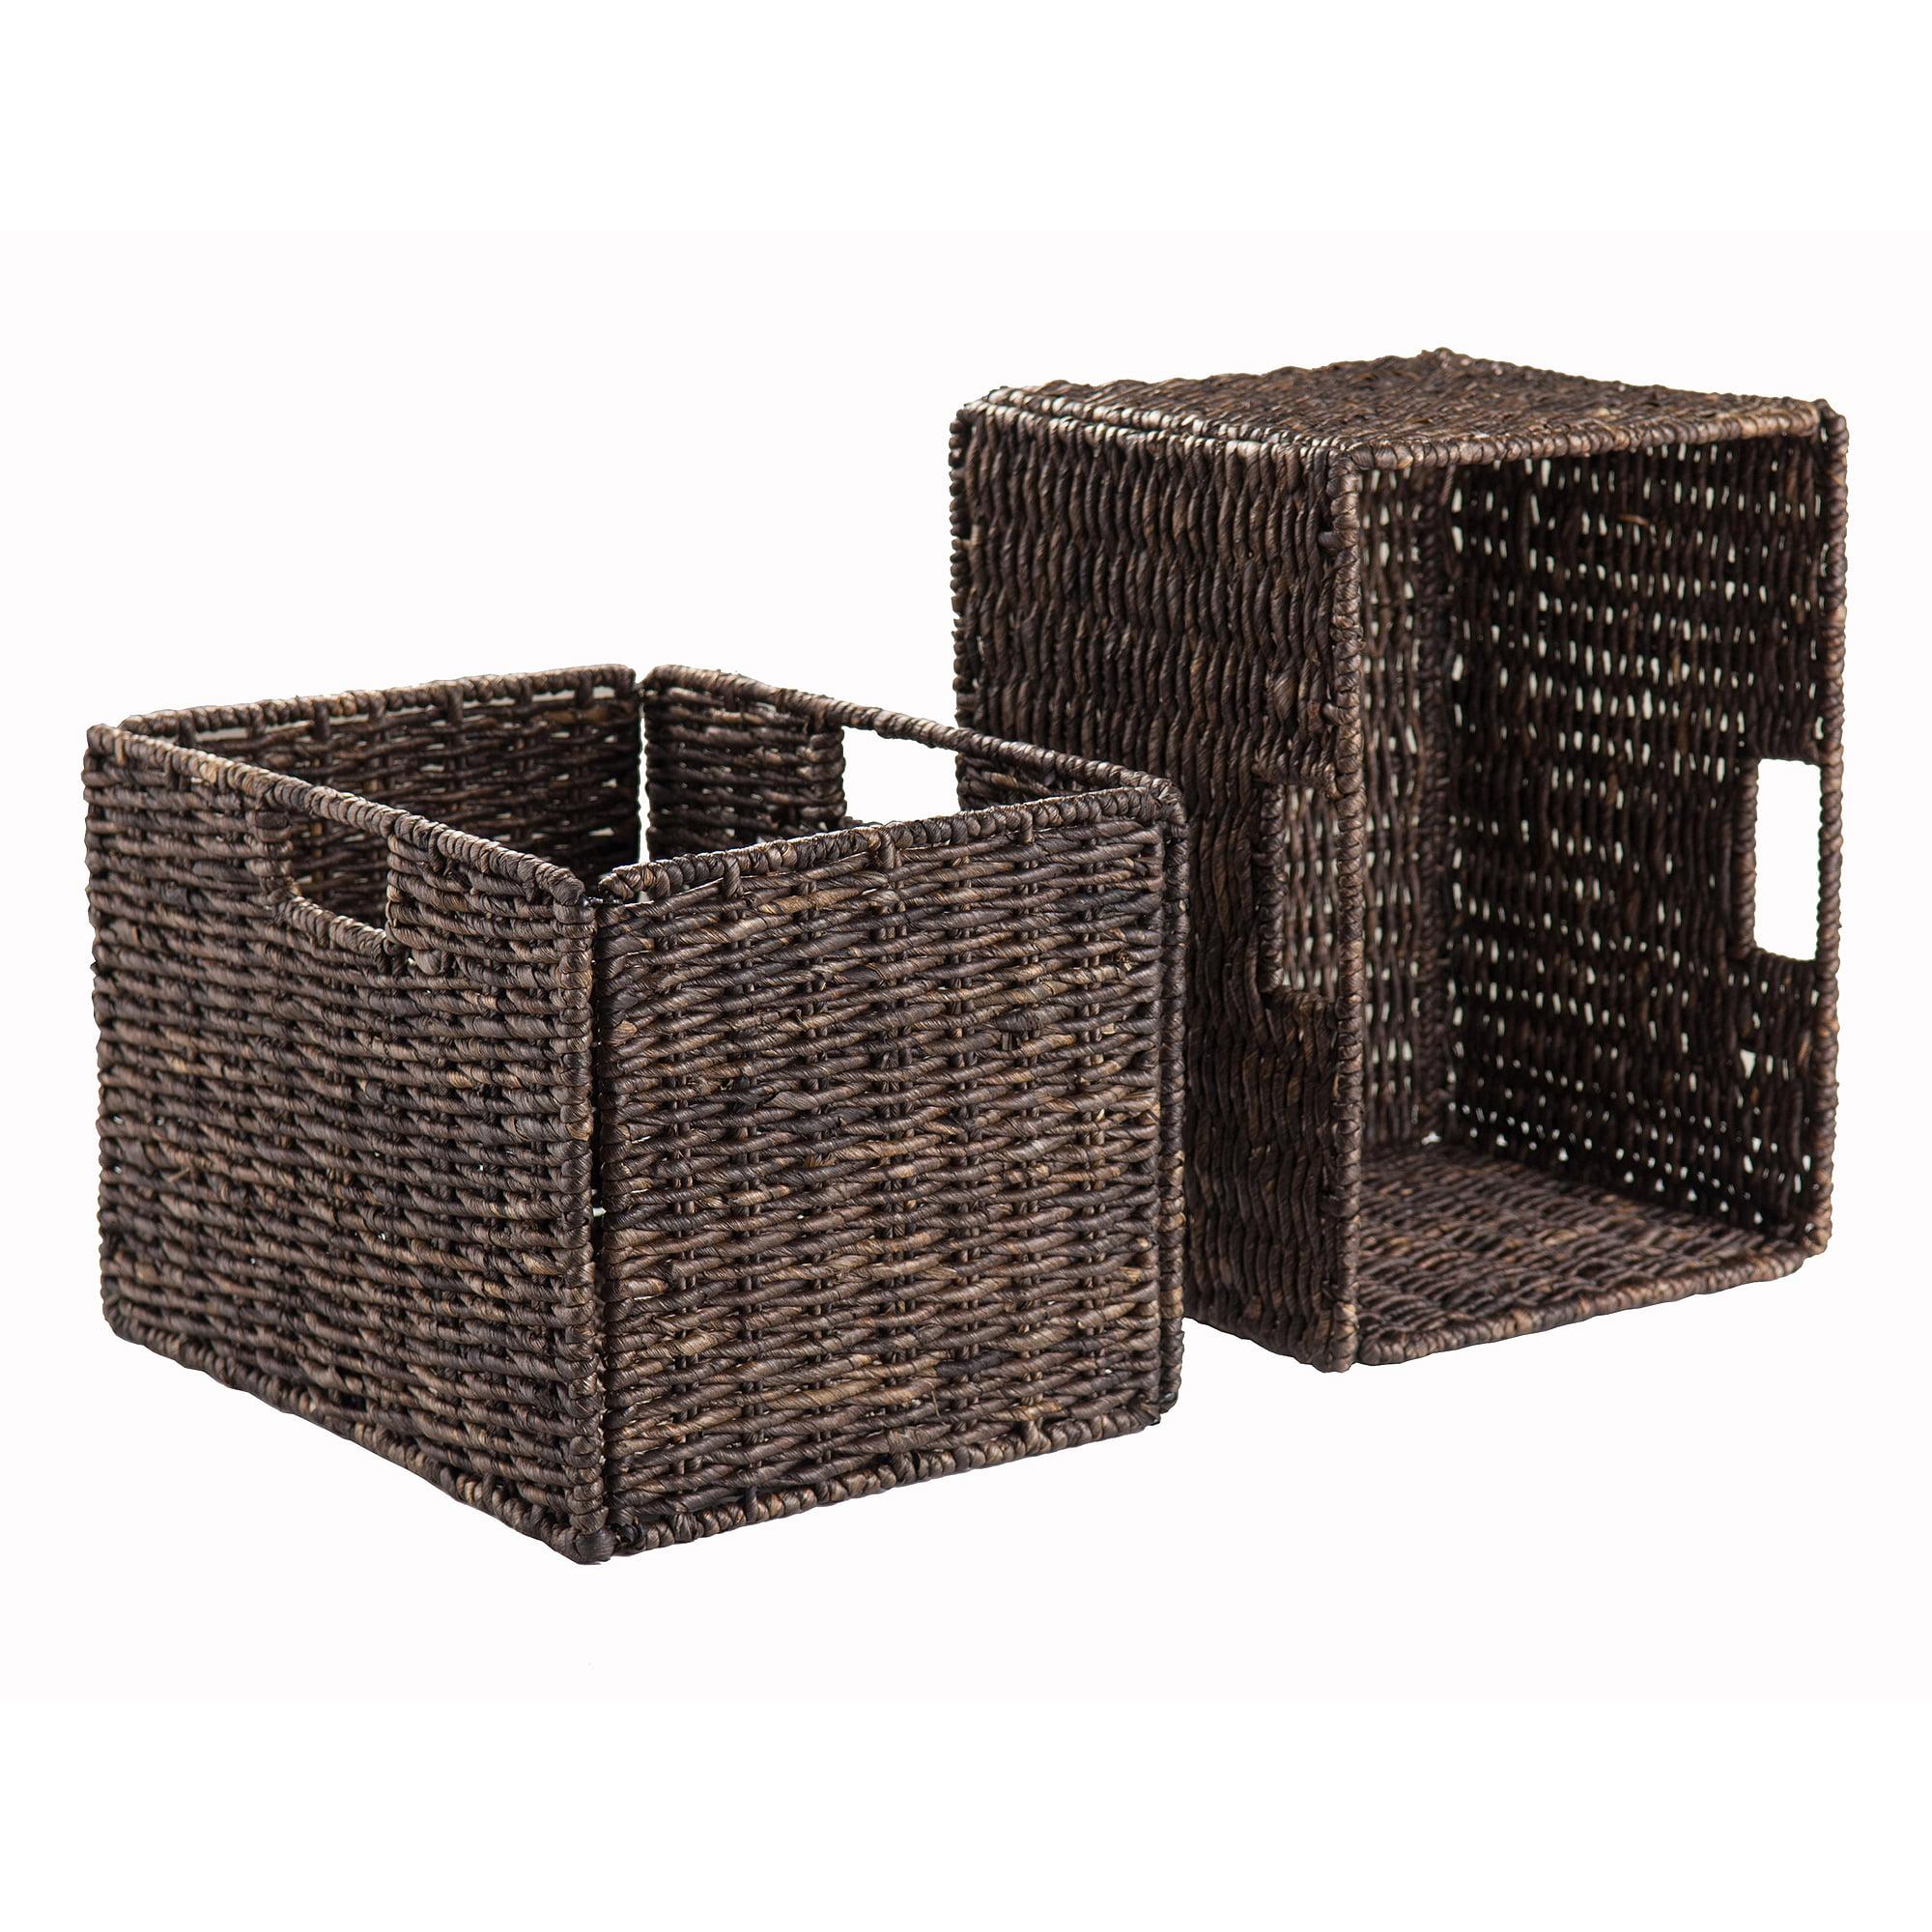 Large Foldable Corn Husk Baskets, Chocolate, Set of 2